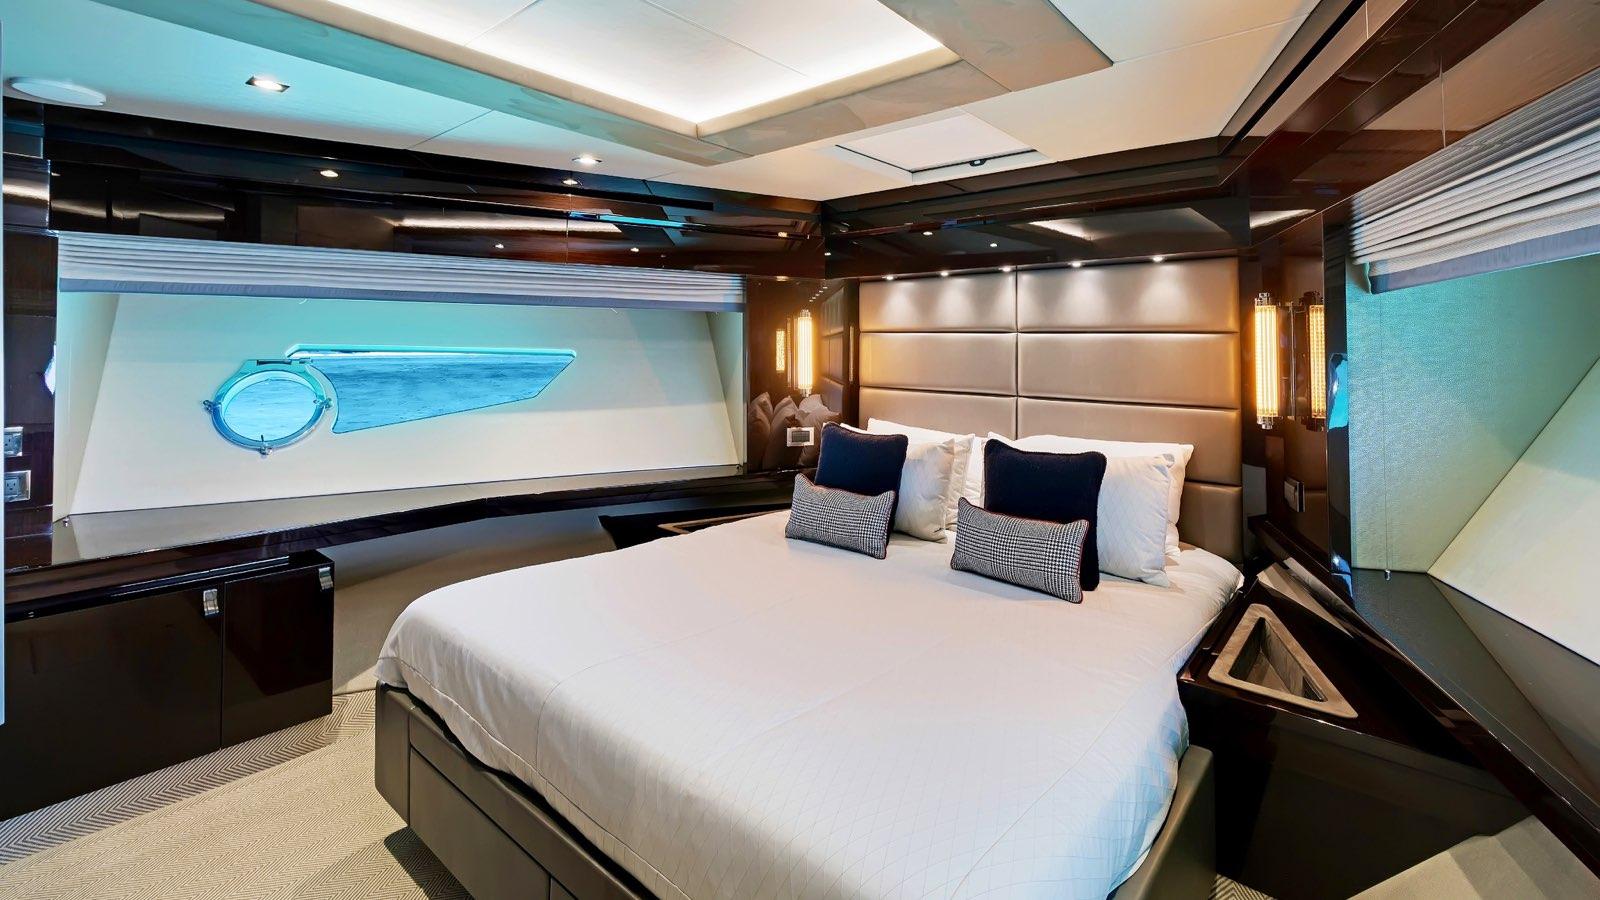 Enterprise_charter_yacht_iyc_interior_VIP_1.jpeg